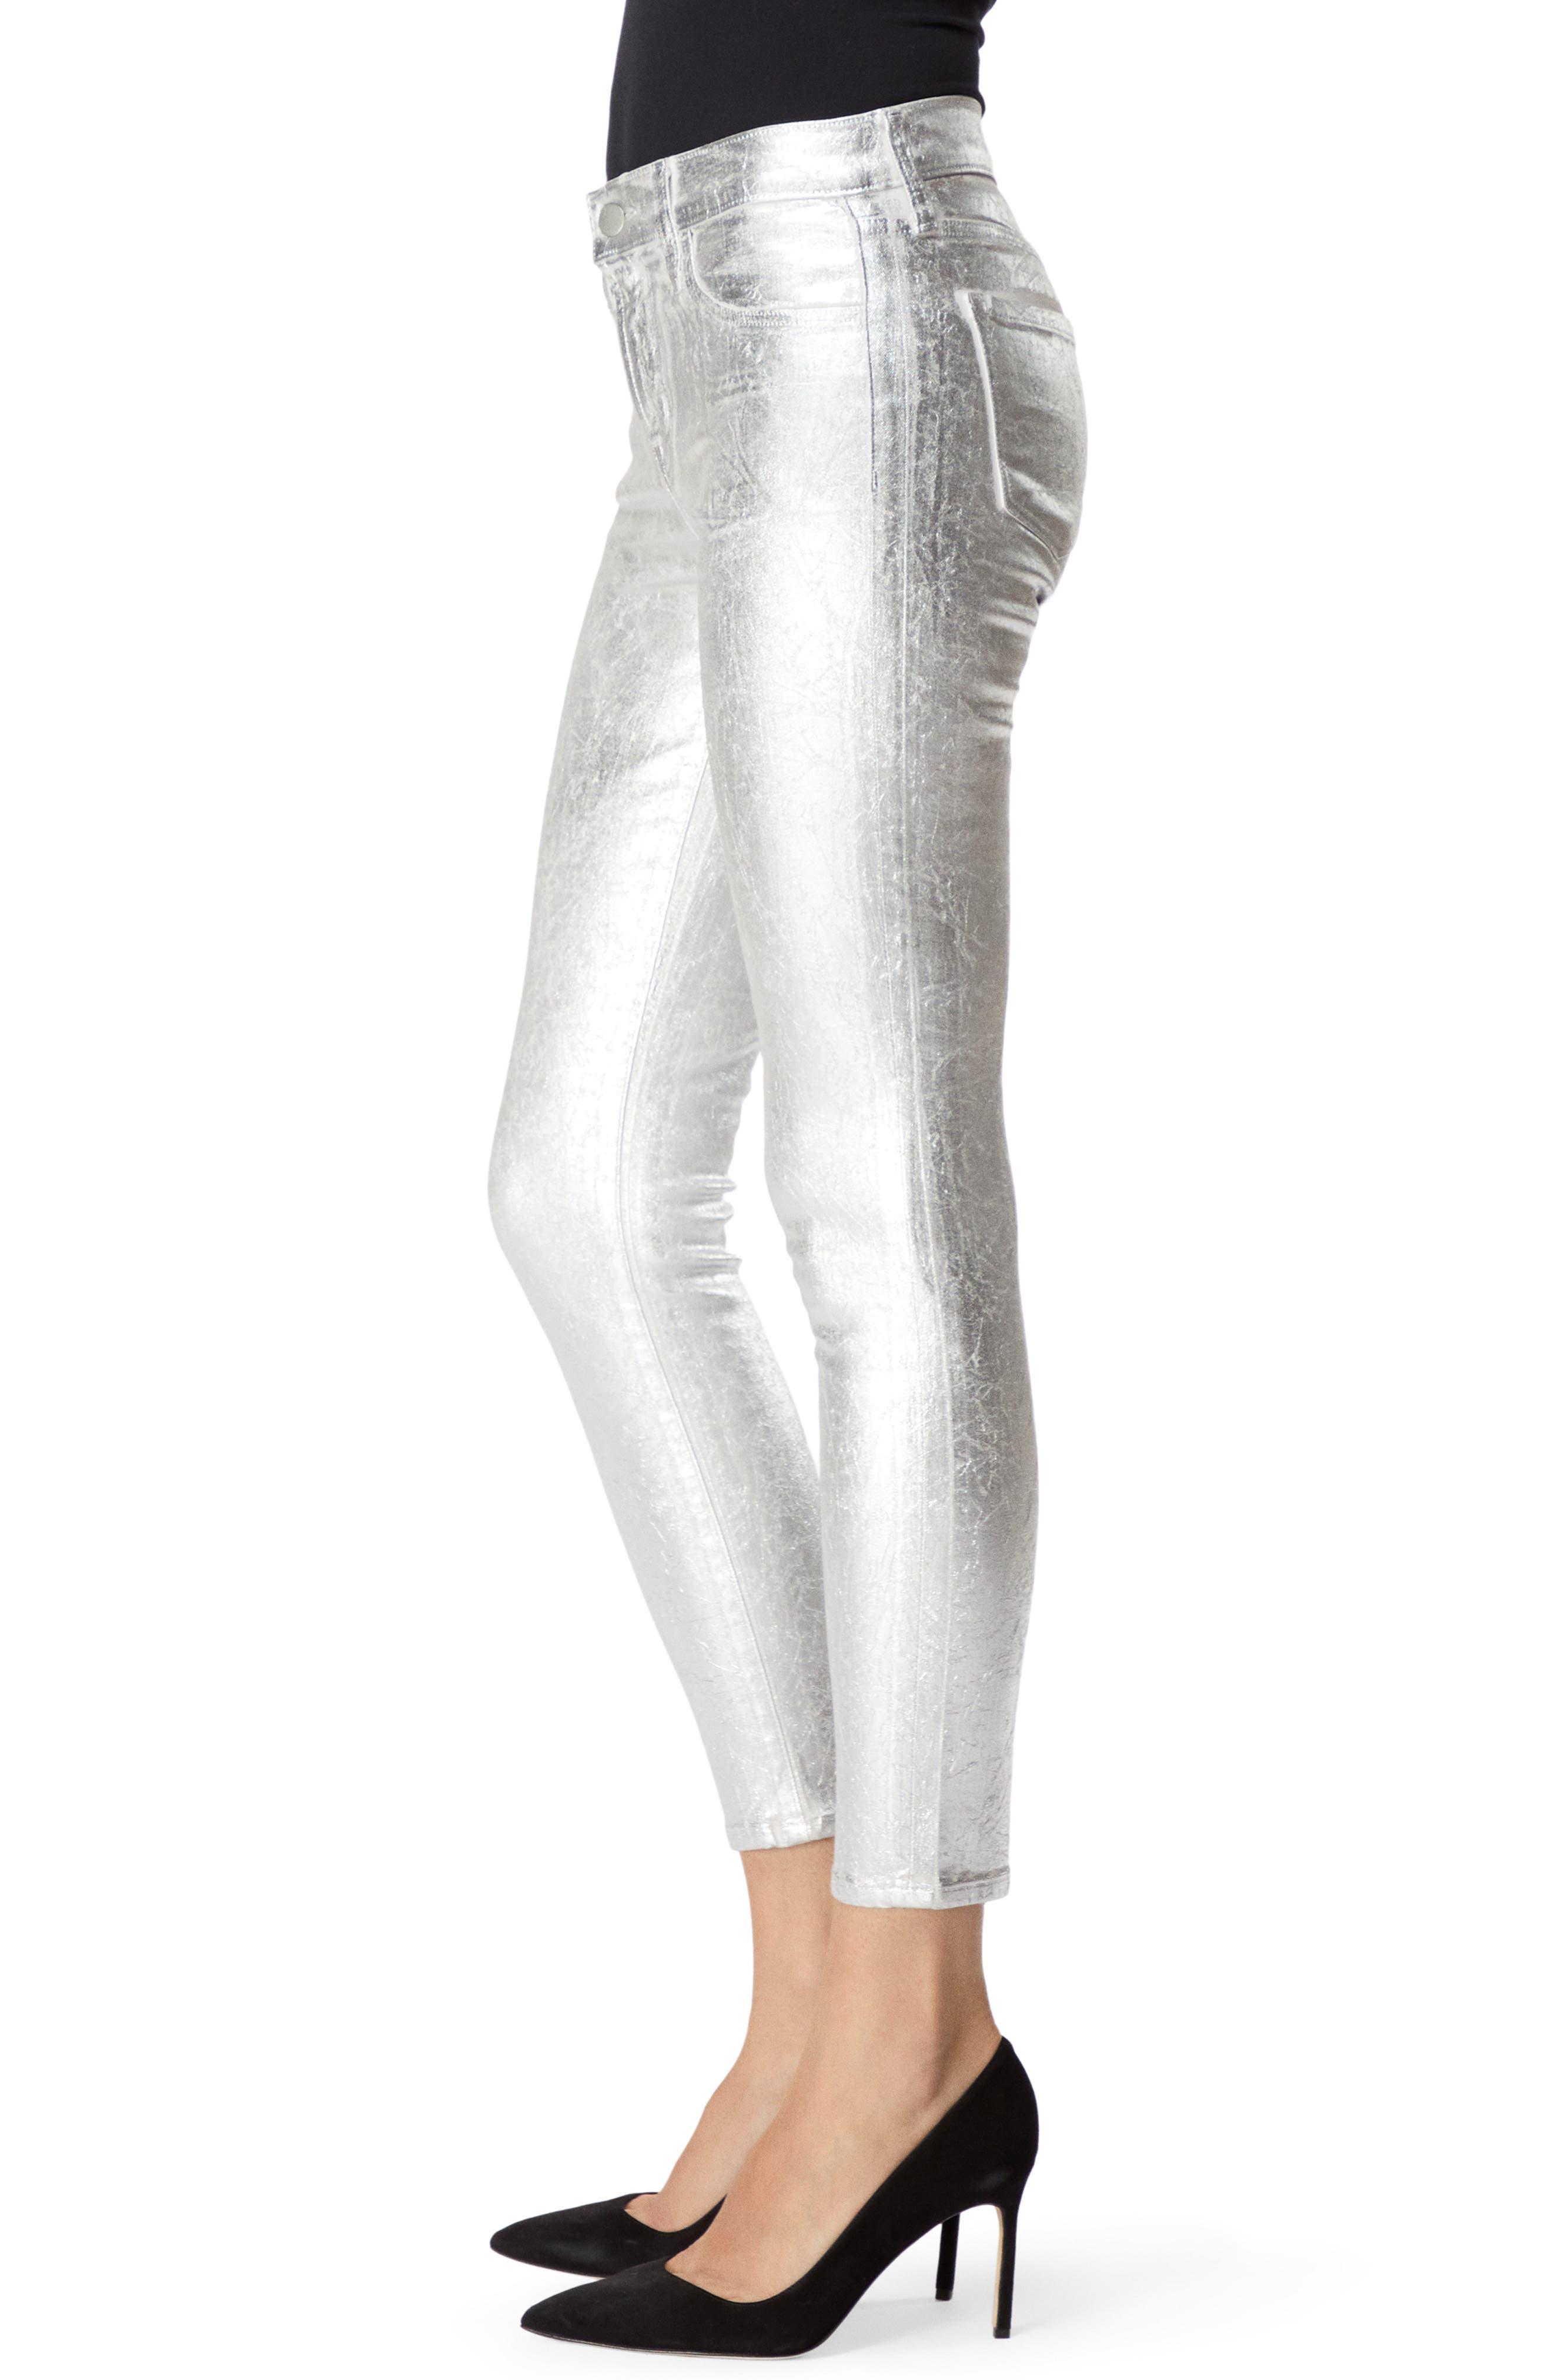 835 Capri Skinny Jeans,                             Alternate thumbnail 3, color,                             SUPERMOON CRISTALLINE